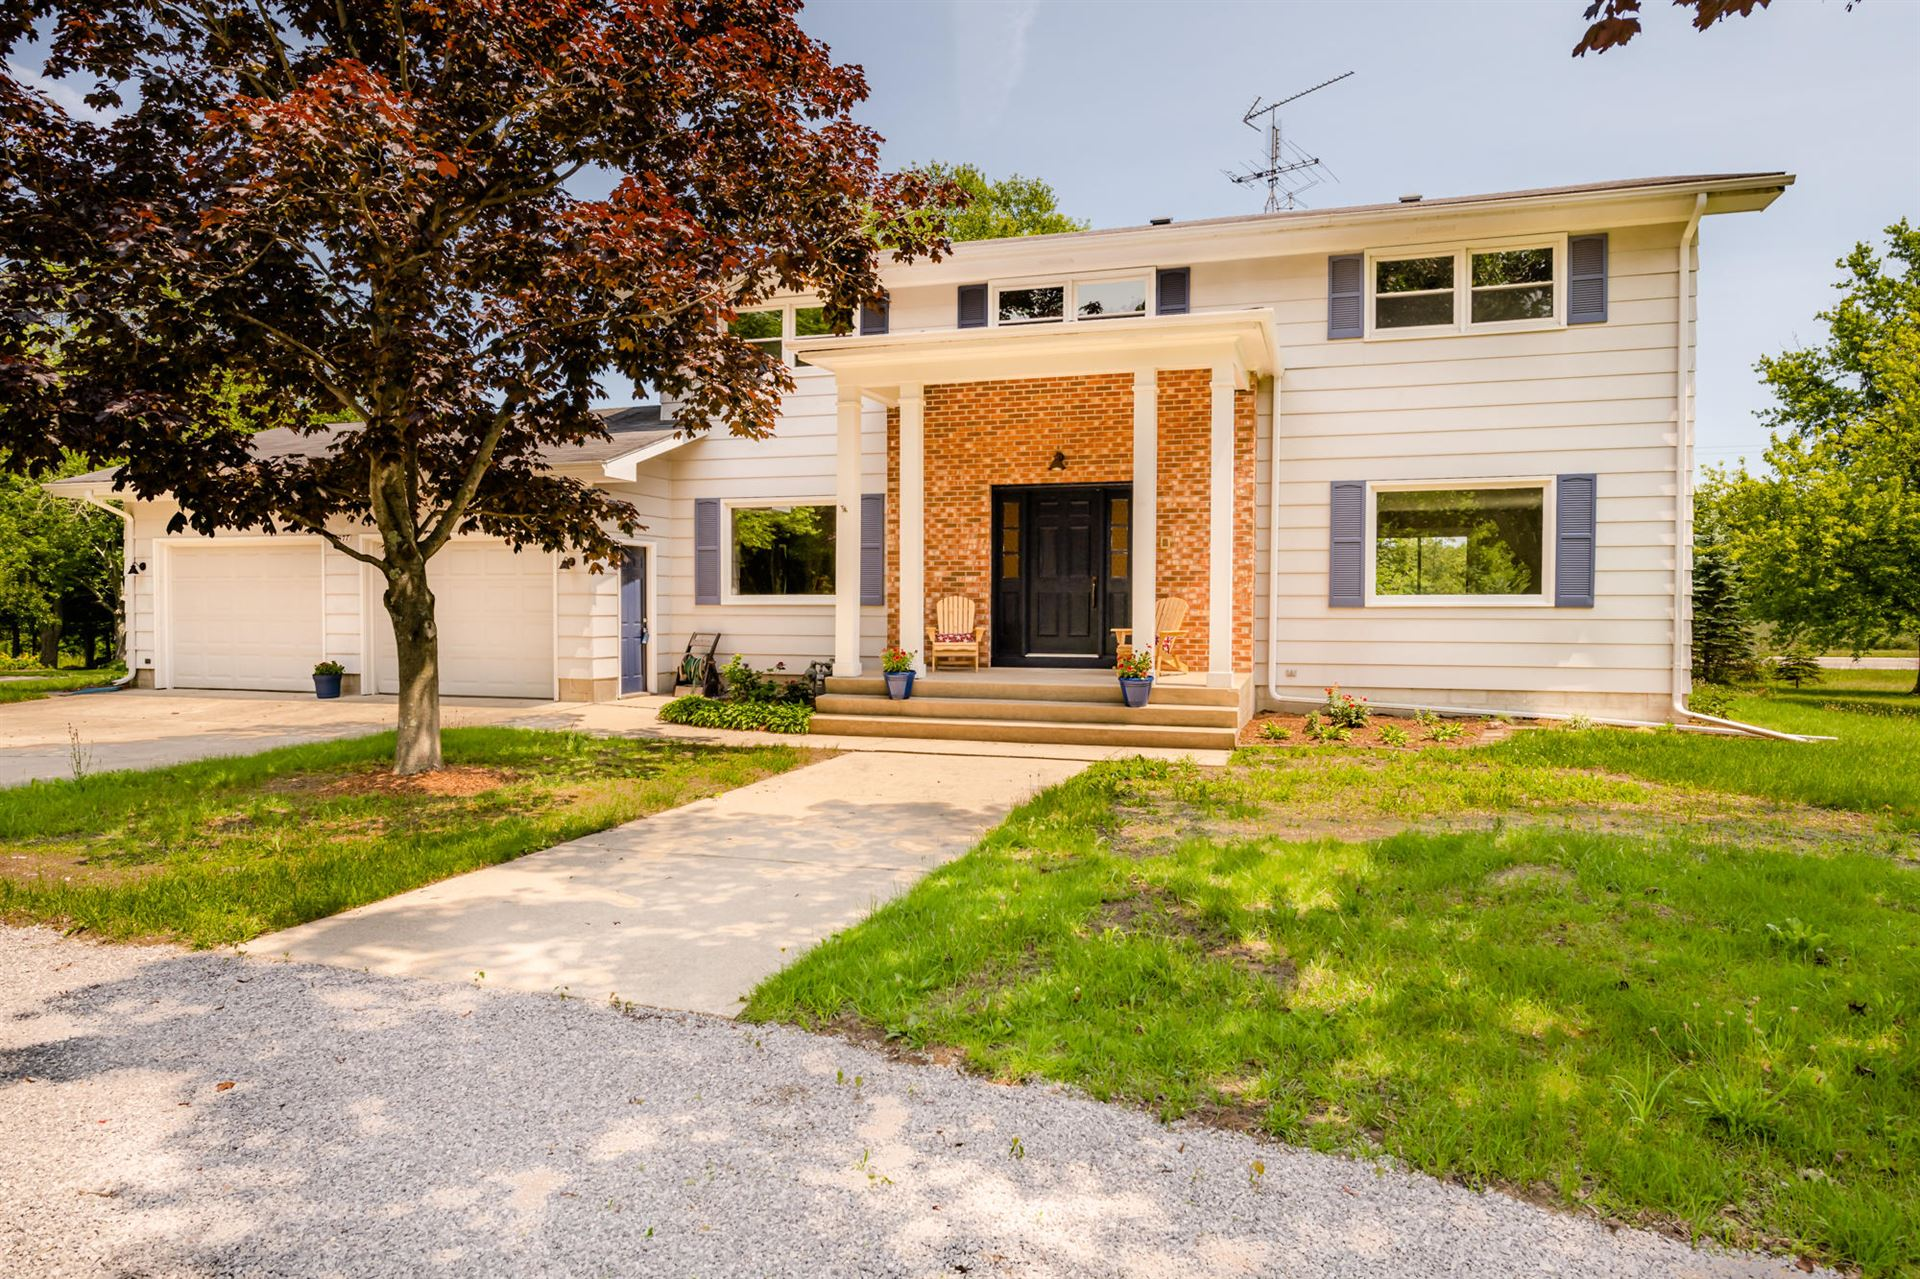 3877 Evergreen Lane, Benton Harbor, MI 49022 - MLS#: 21025901